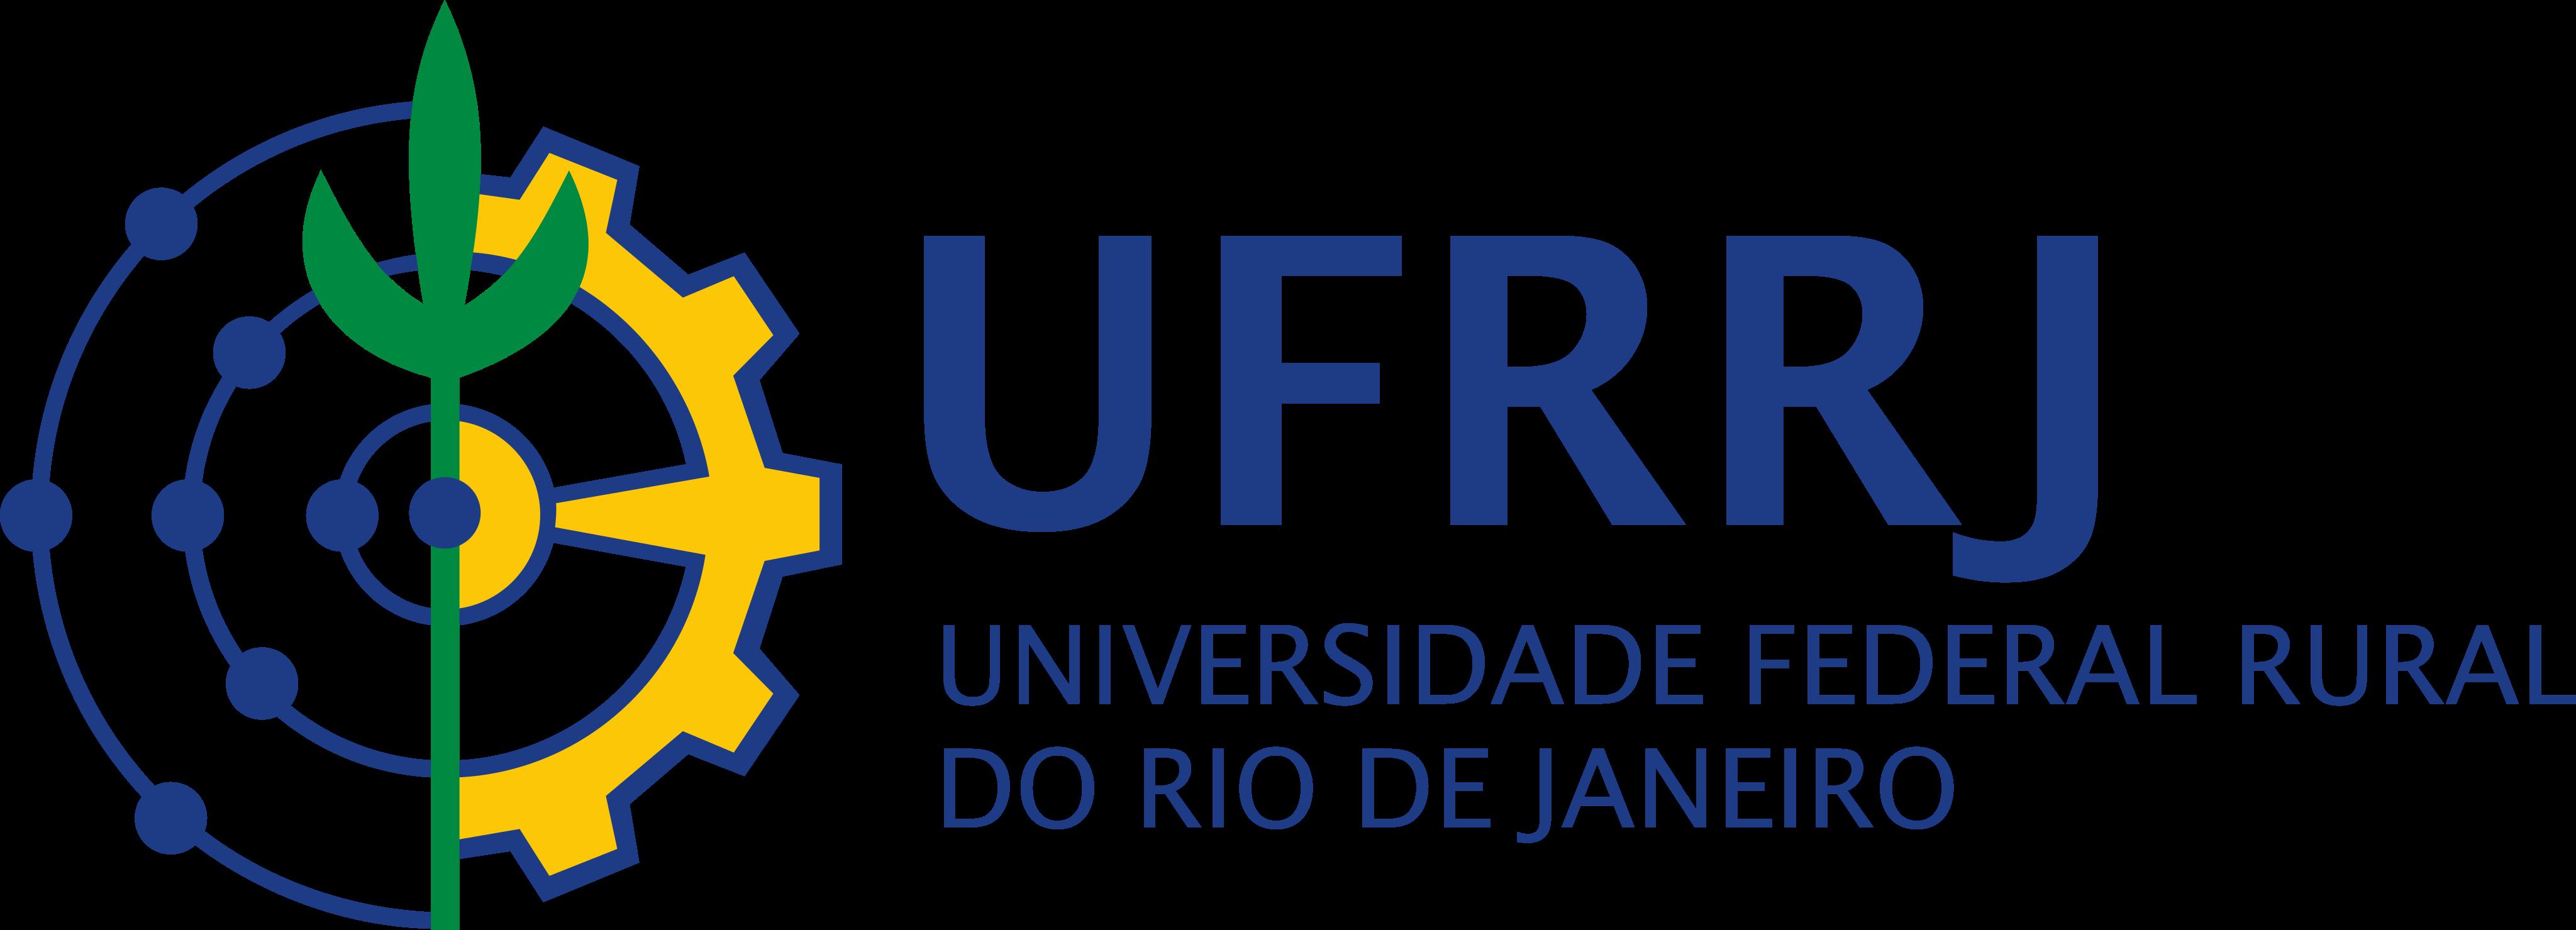 ufrrj logo 3 - UFRRJ Logo